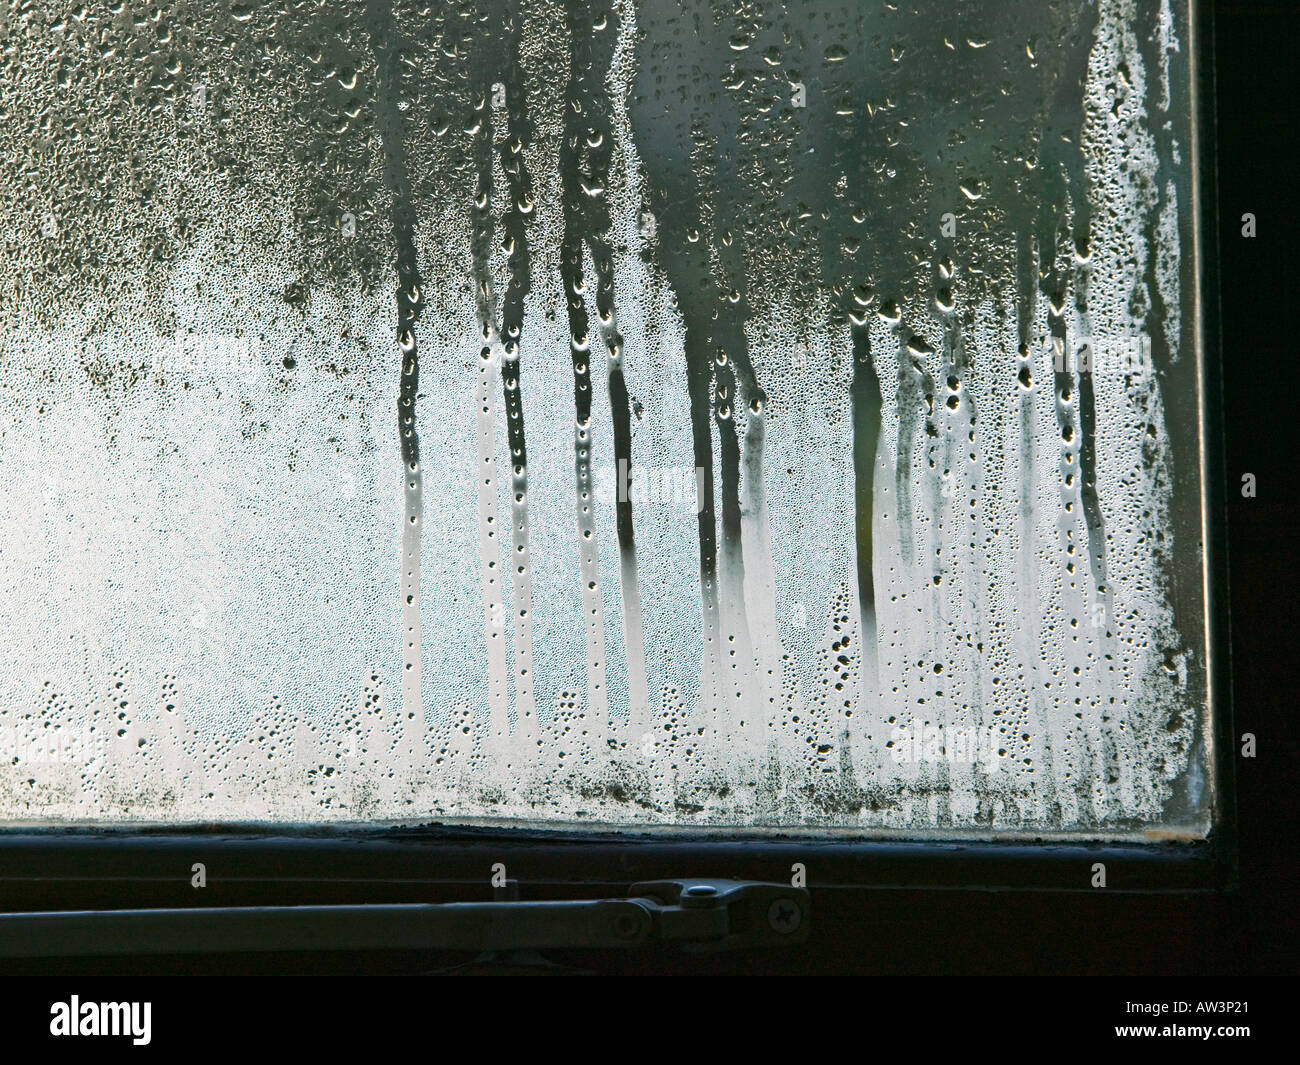 Kondensation auf doppelt verglaste Fenster im Haus Wales UK Stockbild